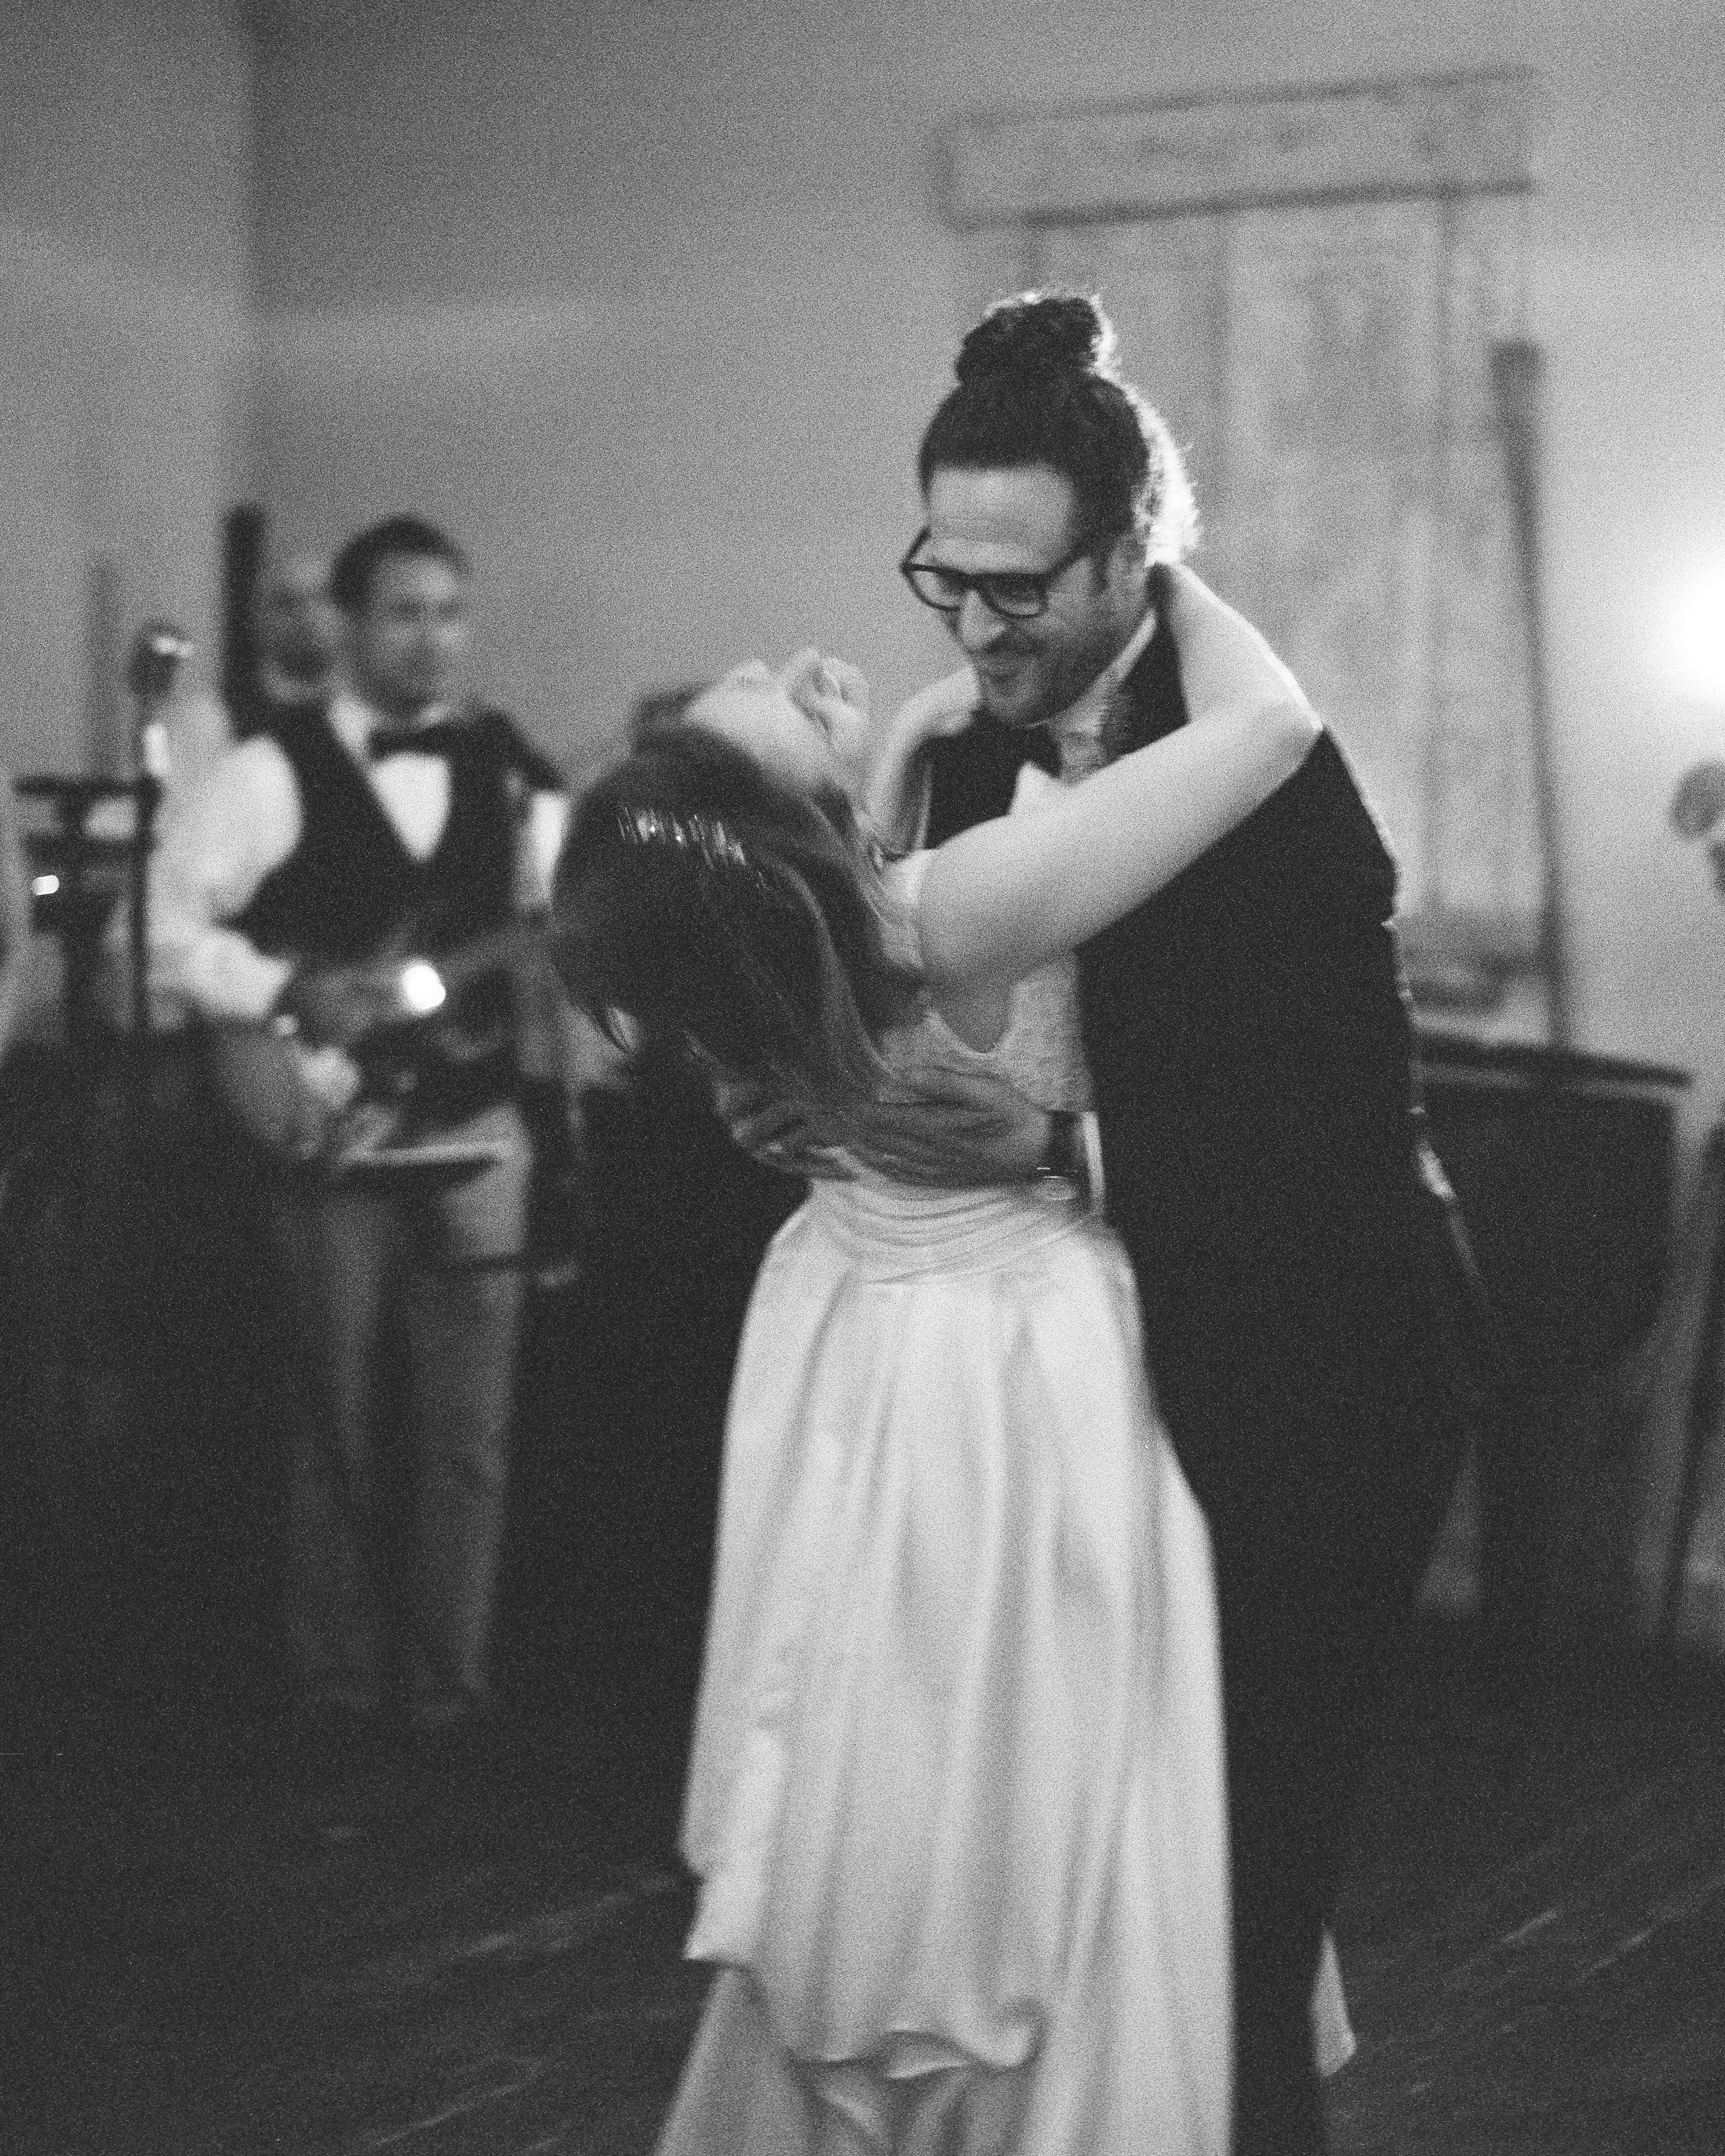 alison-markus-wedding-360-ds111251.jpg